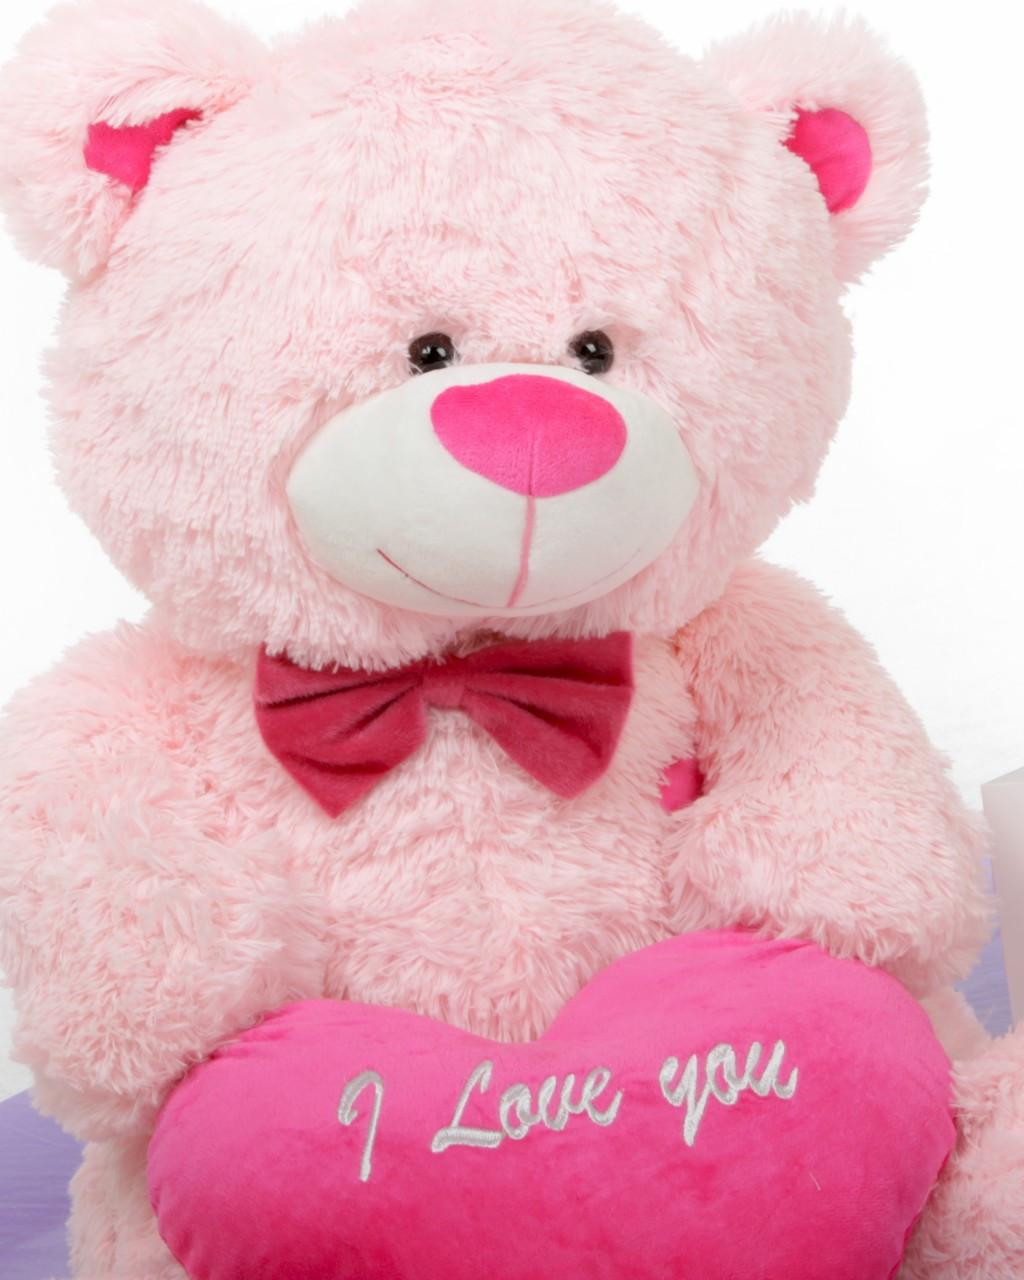 30in Pink Teddy Bear with I Love You Heart LuLu Shags